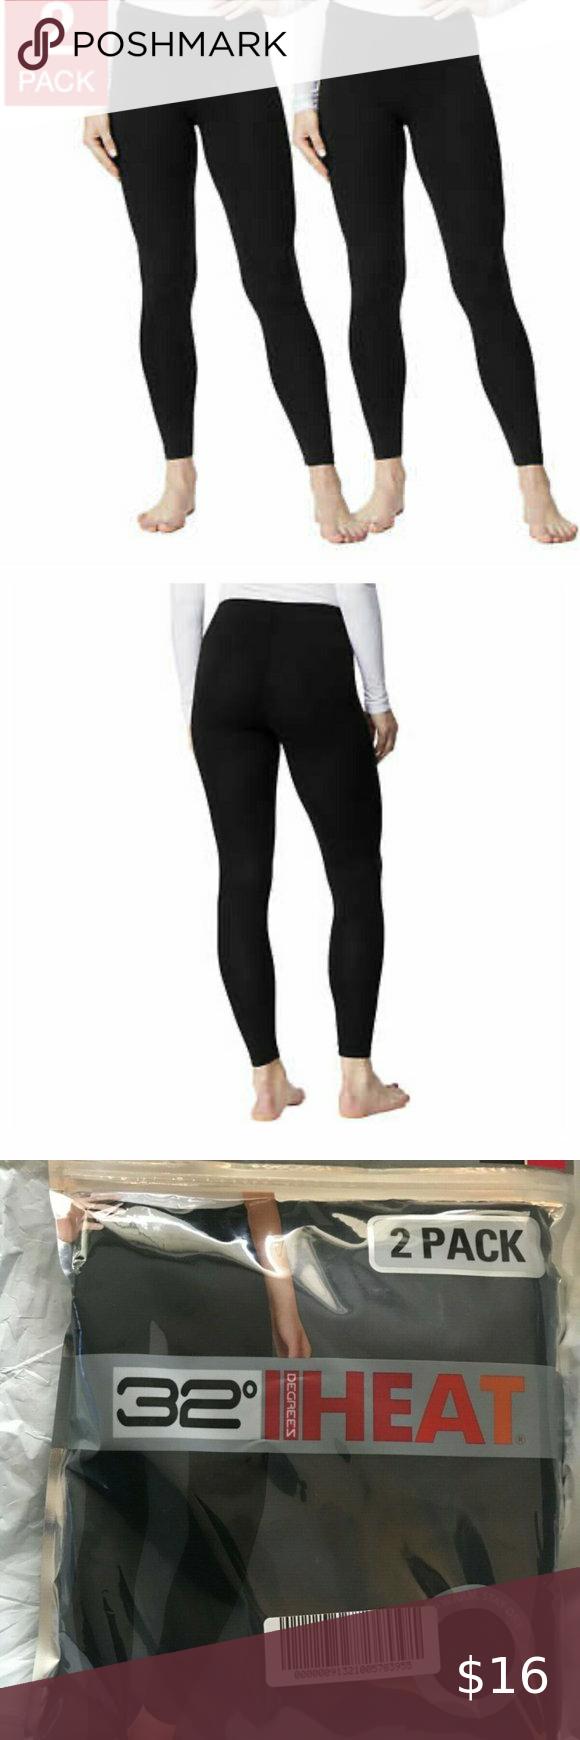 32 DEGREES Ladies Base Layer Heat Pant 2-Pack